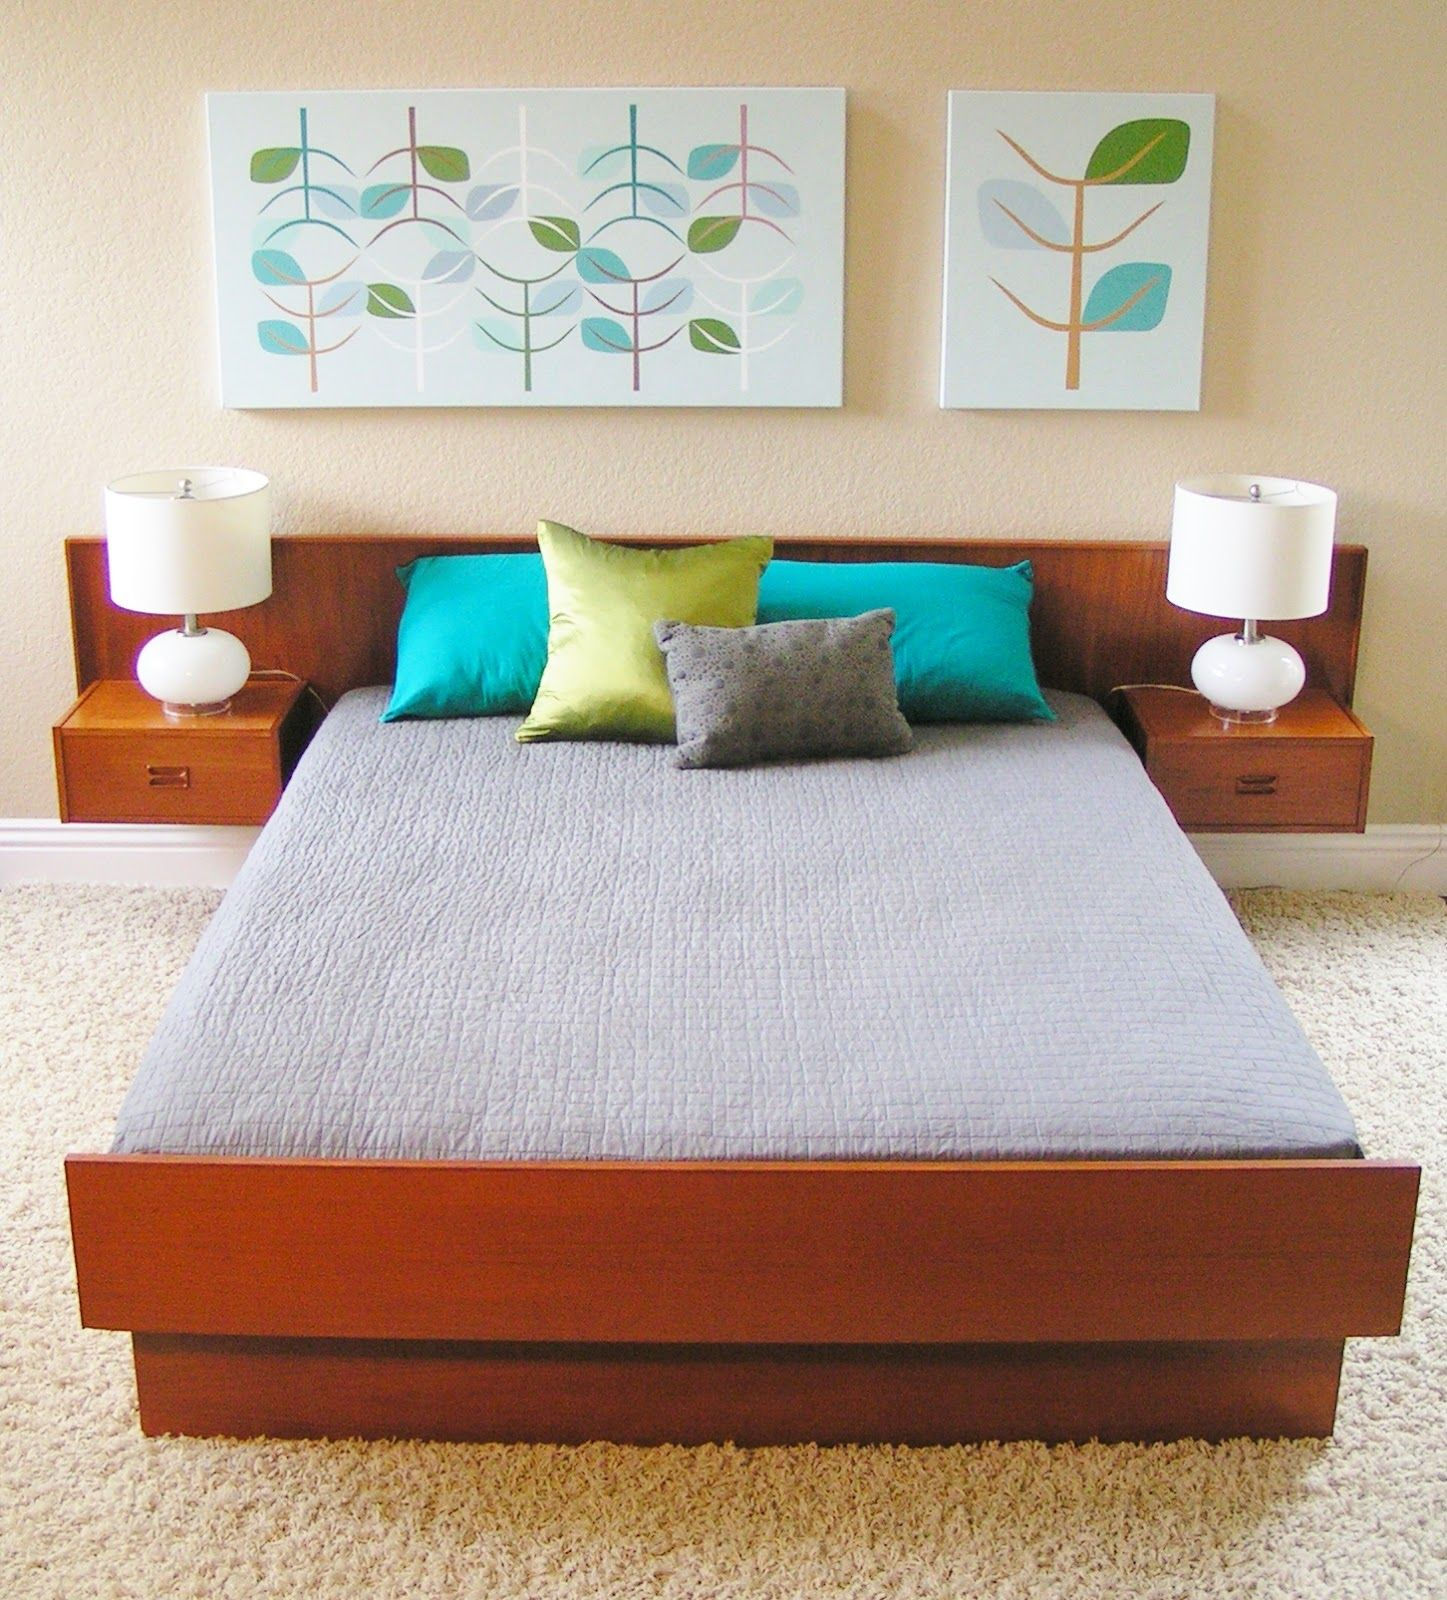 Visit The Bedroom Furniture Reviews And Bestkingsizebedframes Here You Check Three Categories In Kingsizebeds Like Metal Wooden